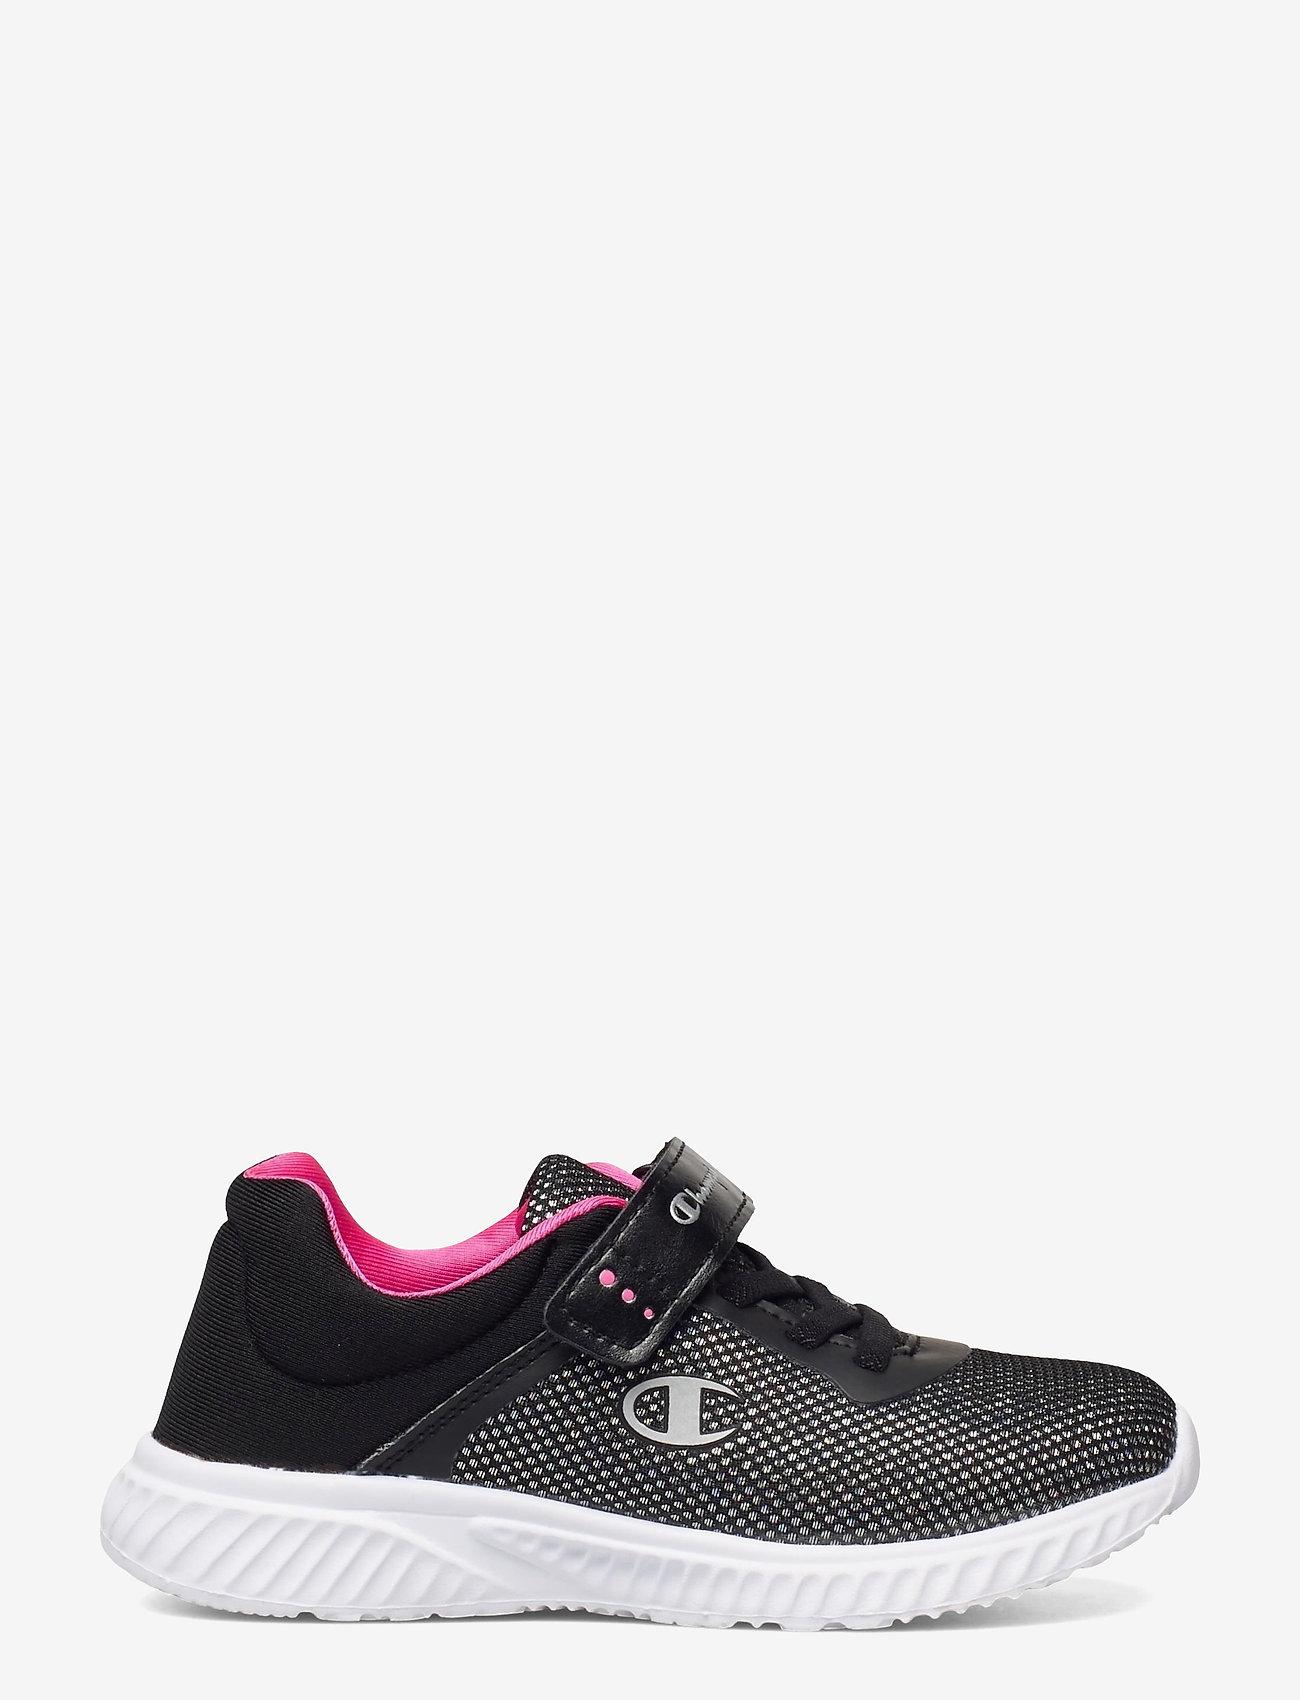 Champion - Low Cut Shoe SOFTY 2.0 G PS - niedriger schnitt - black beauty - 1